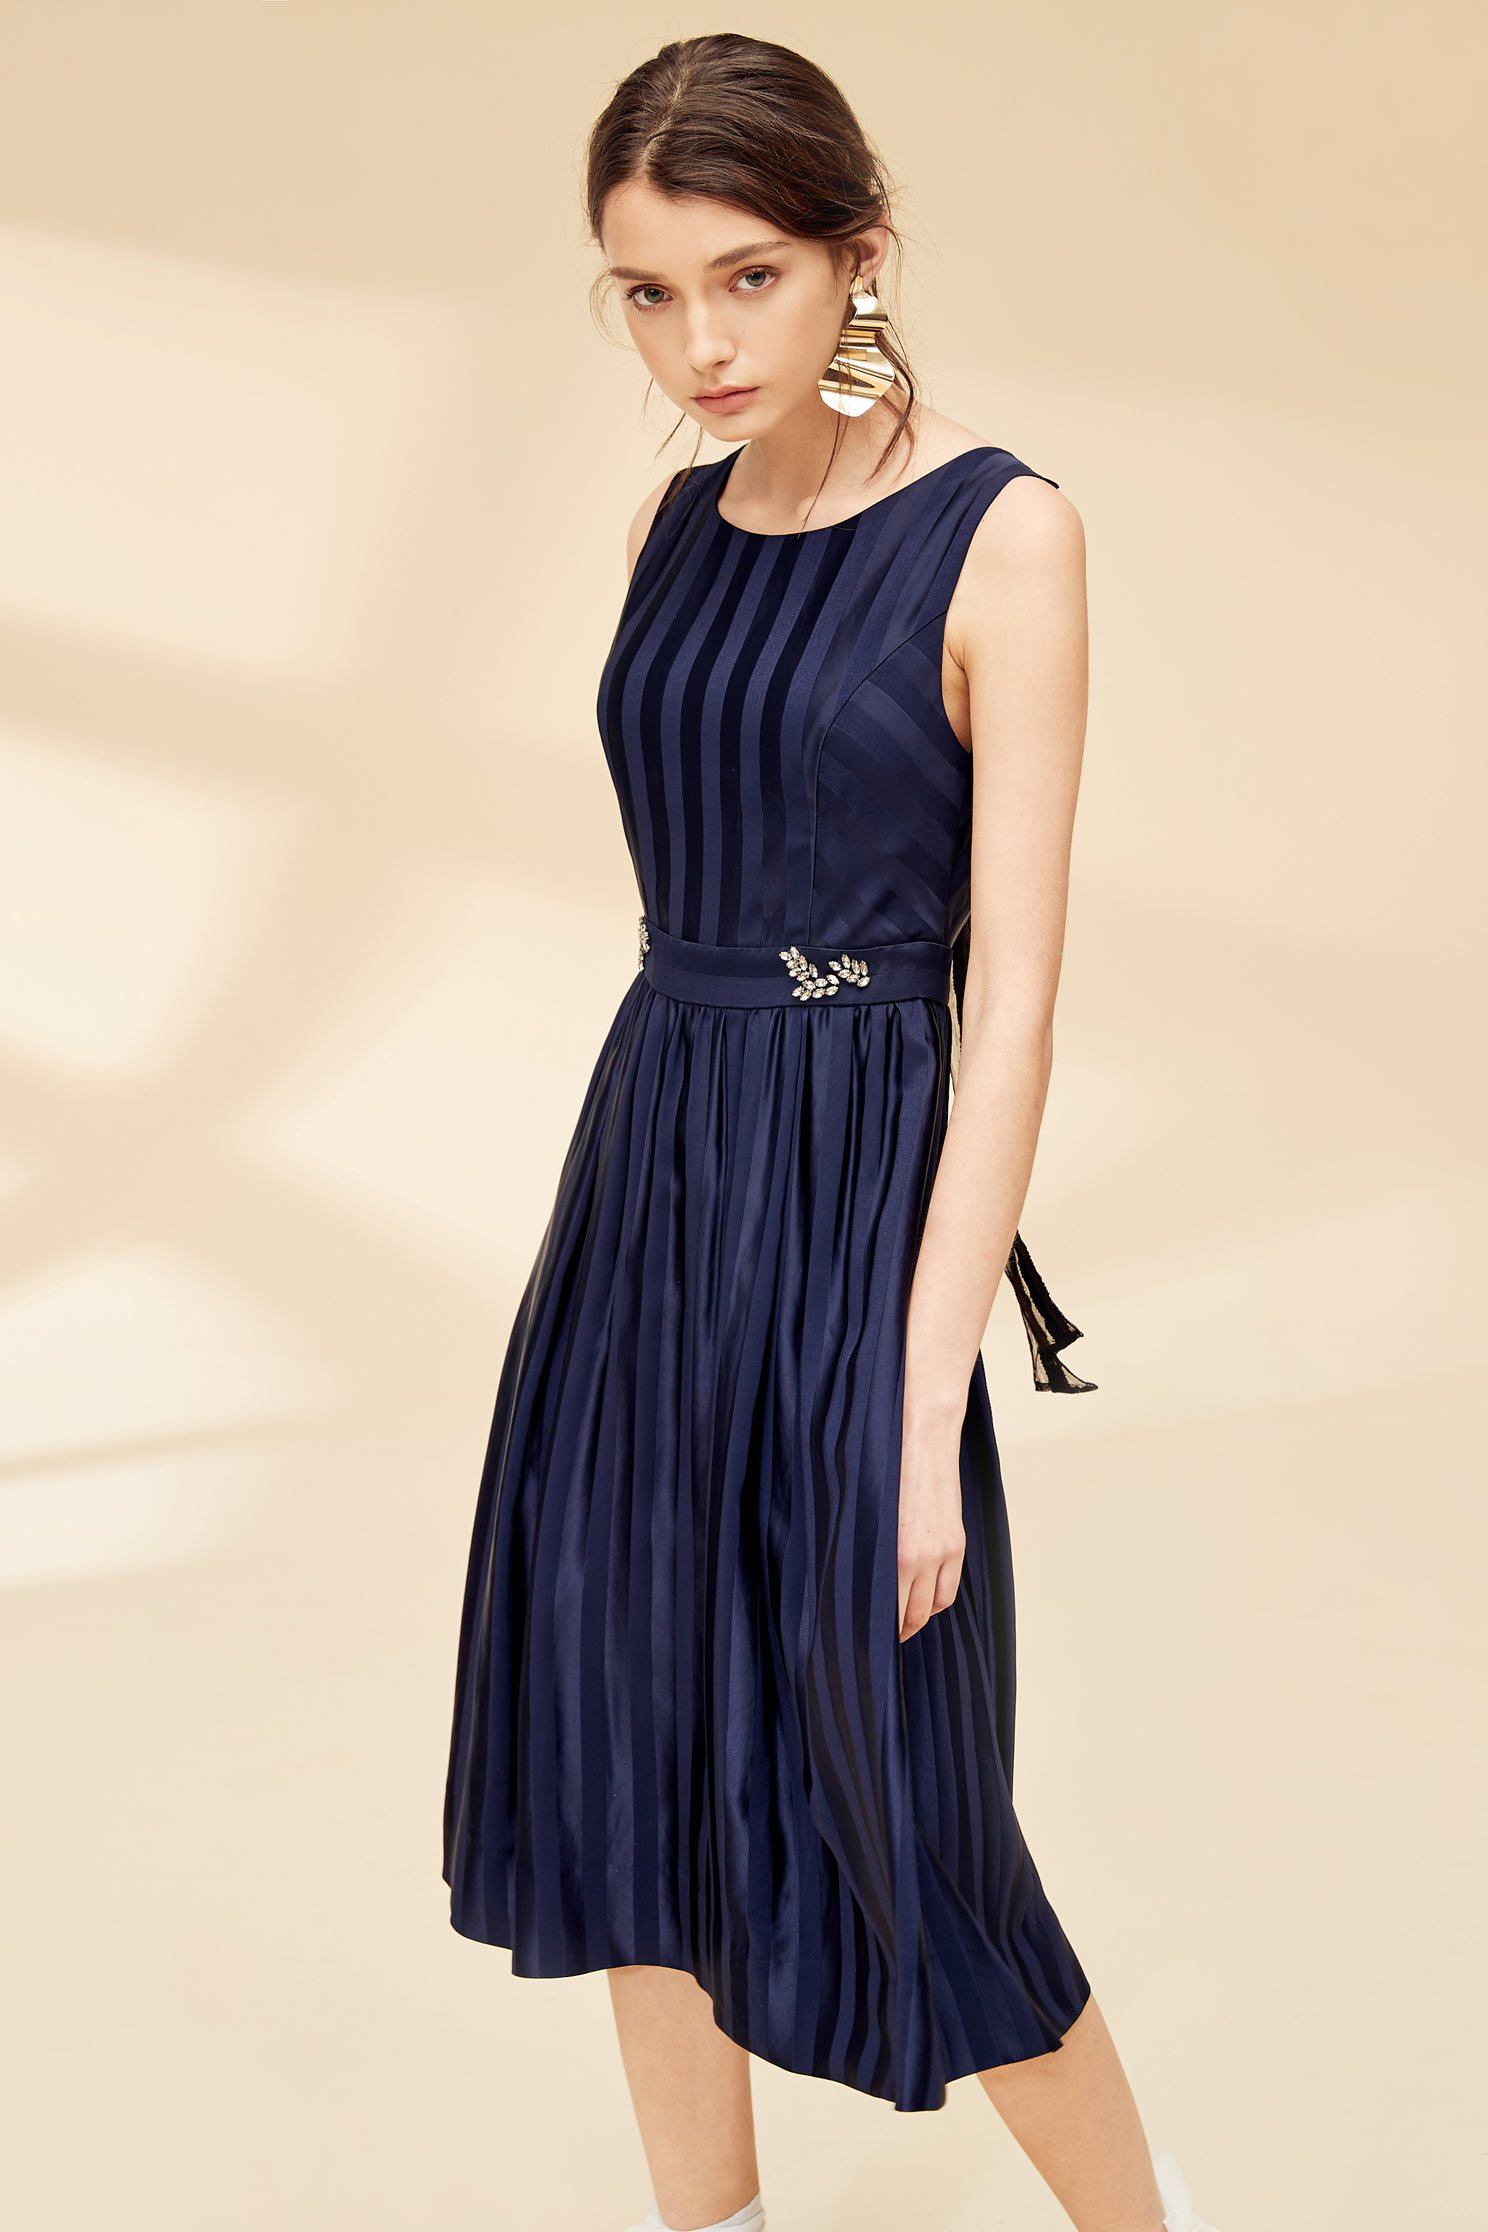 Elegant fashion dress,u-neckdress,cocktaildress,sleevelessdress